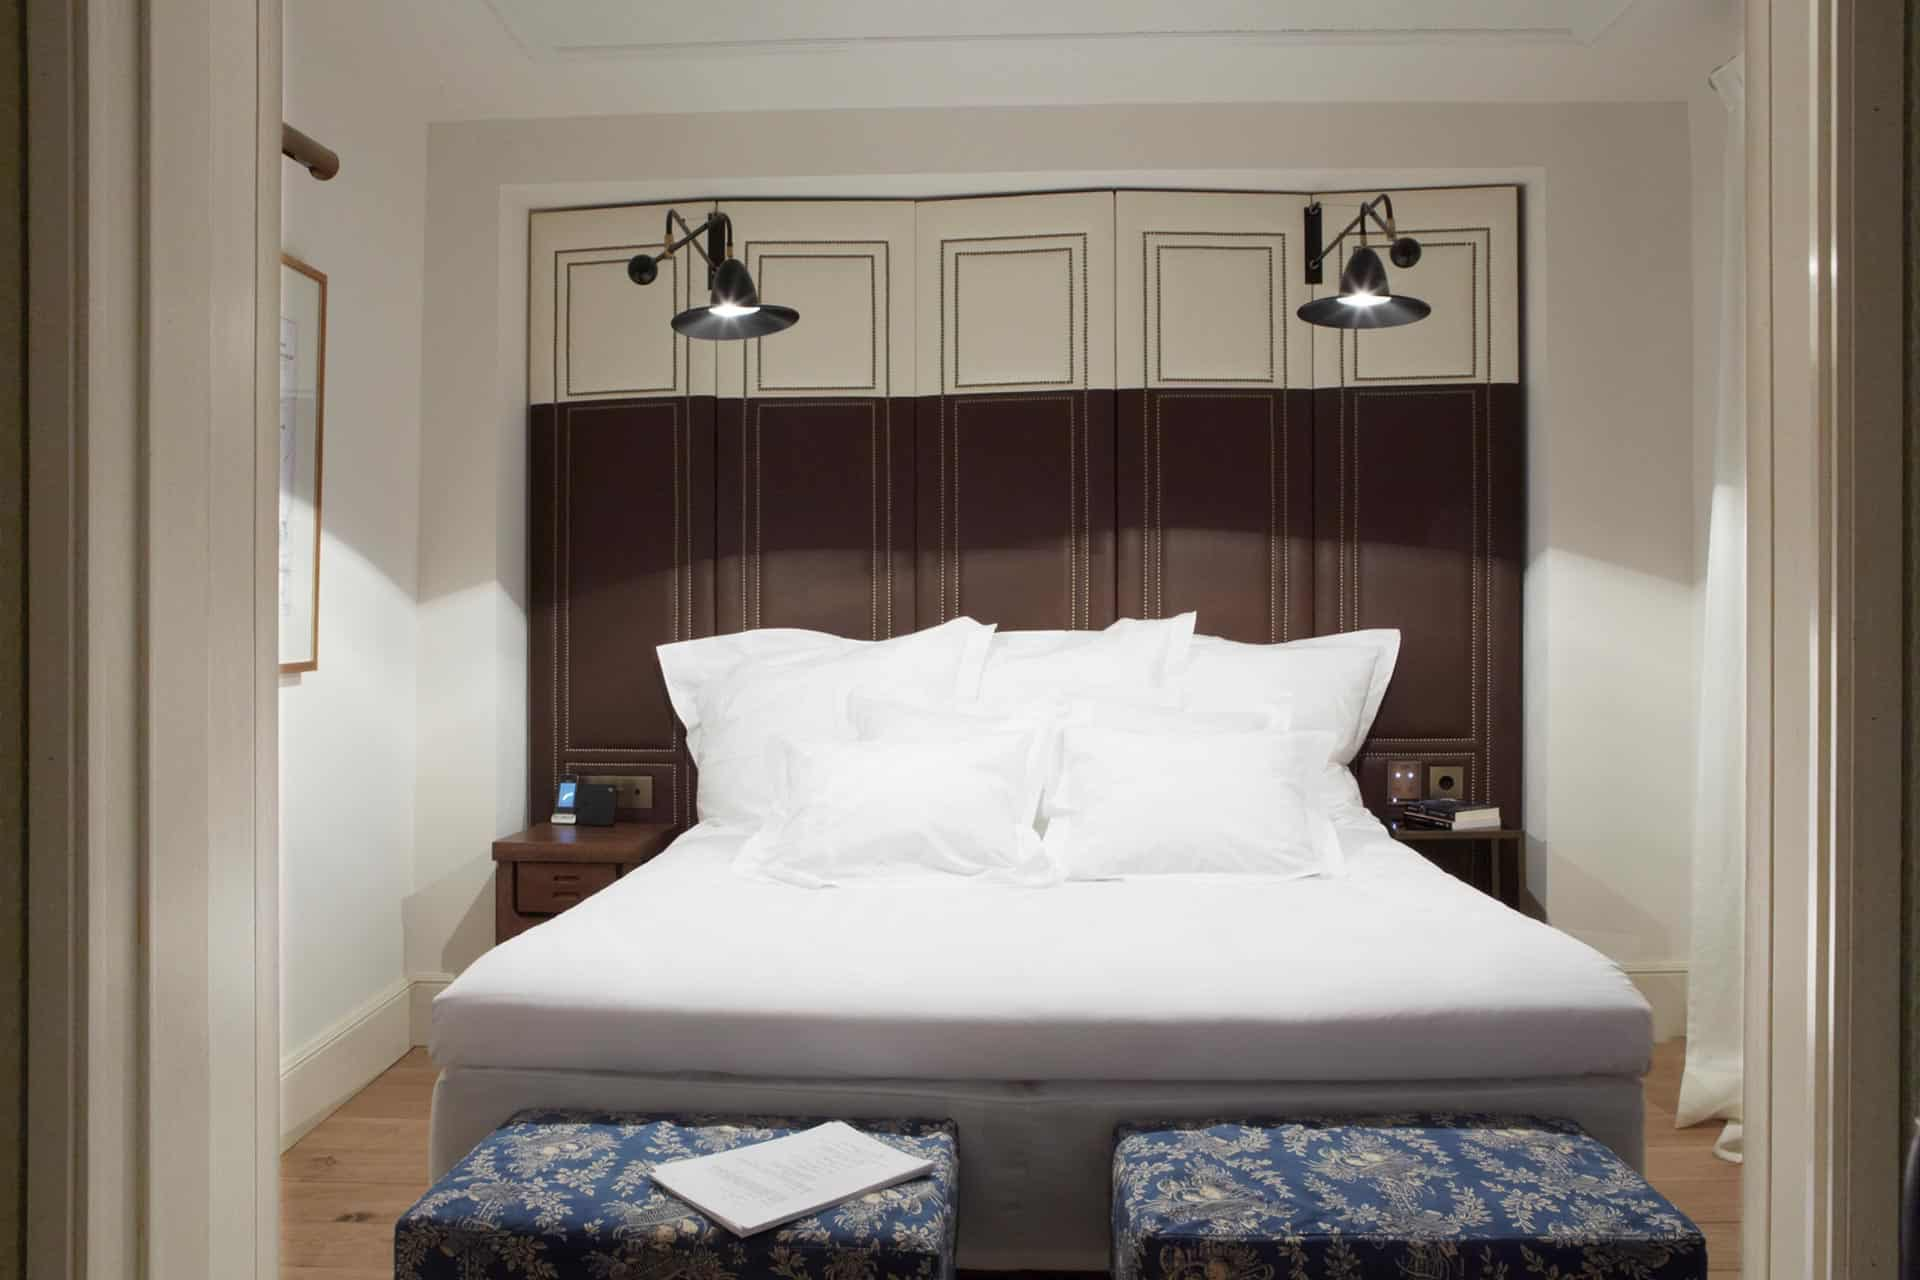 Hotel Cort Rooms